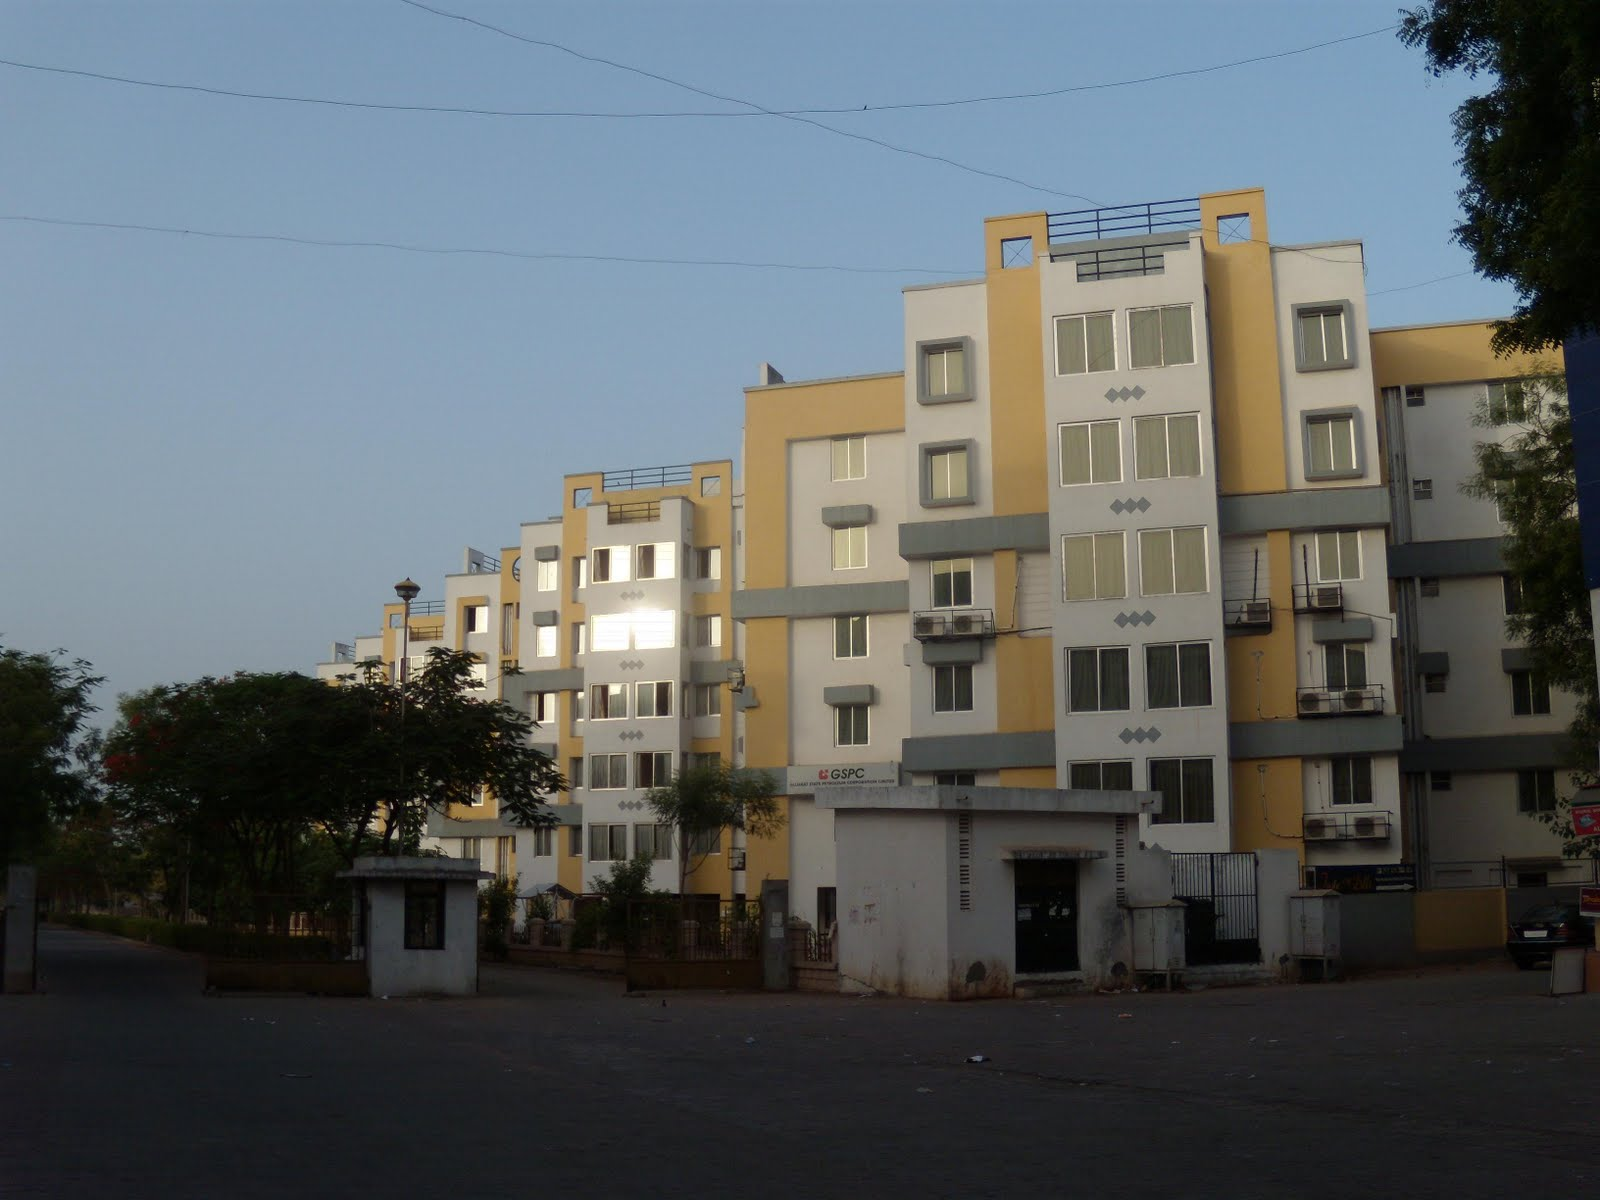 Studio Apartment Ahmedabad Tcs brilliant studio apartment ahmedabad tcs and decorating ideas